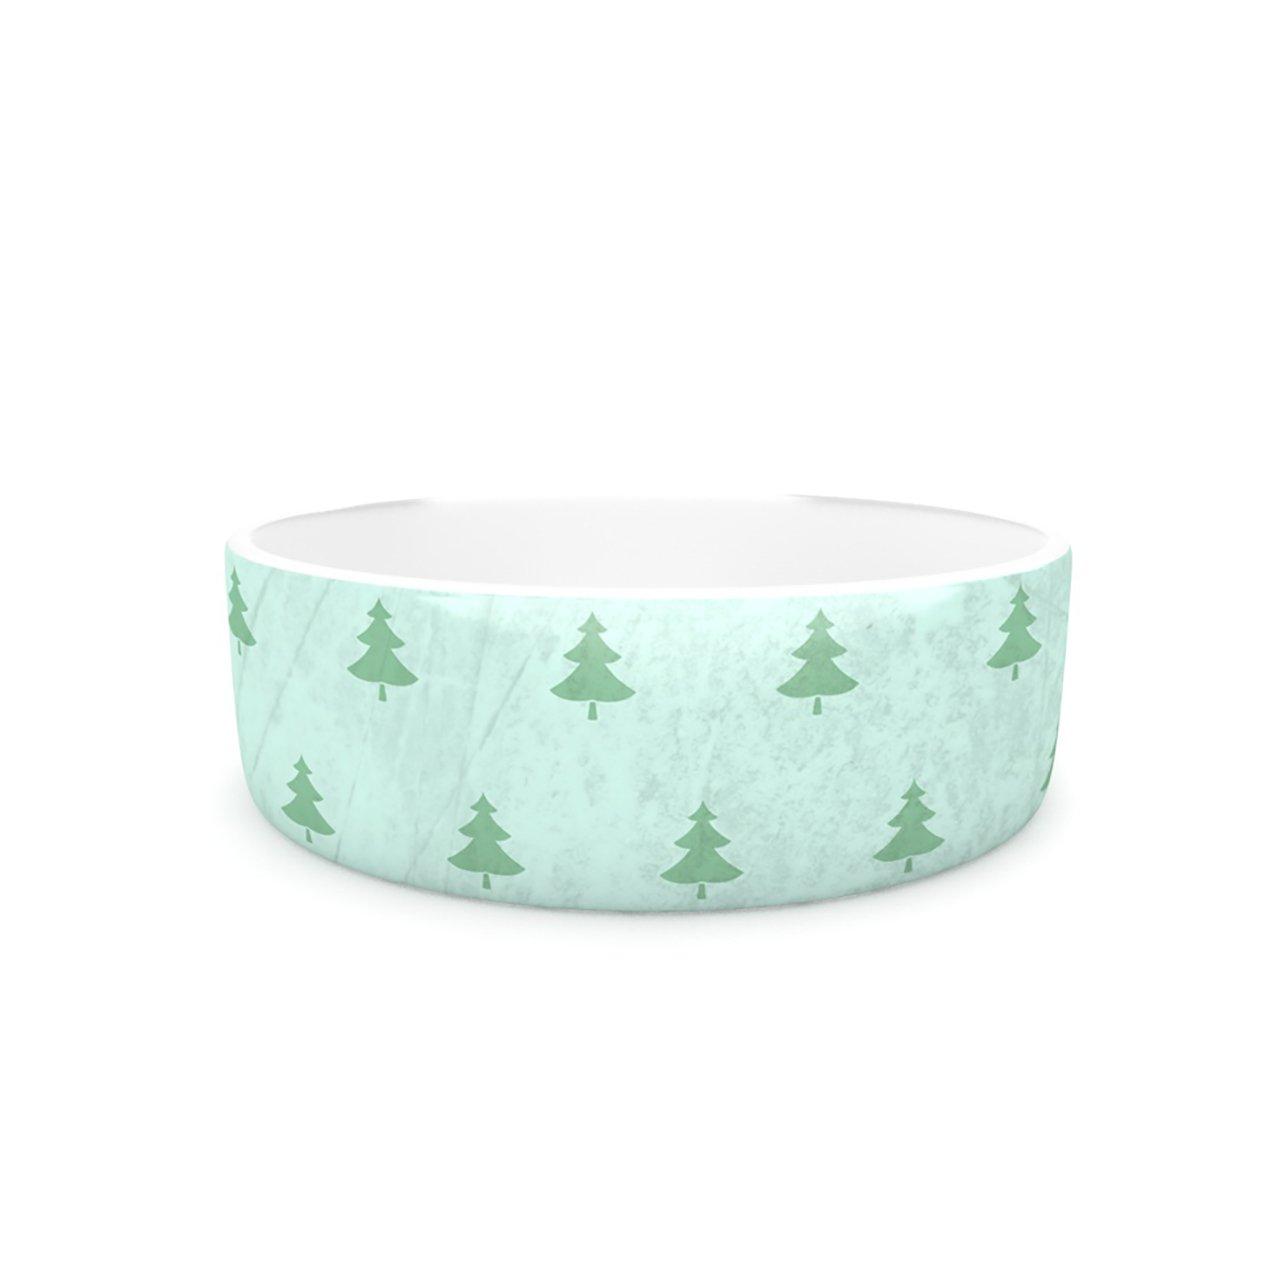 Kess InHouse Snap Studio Pine Pattern Green  Pet Bowl, 7-Inch, Teal